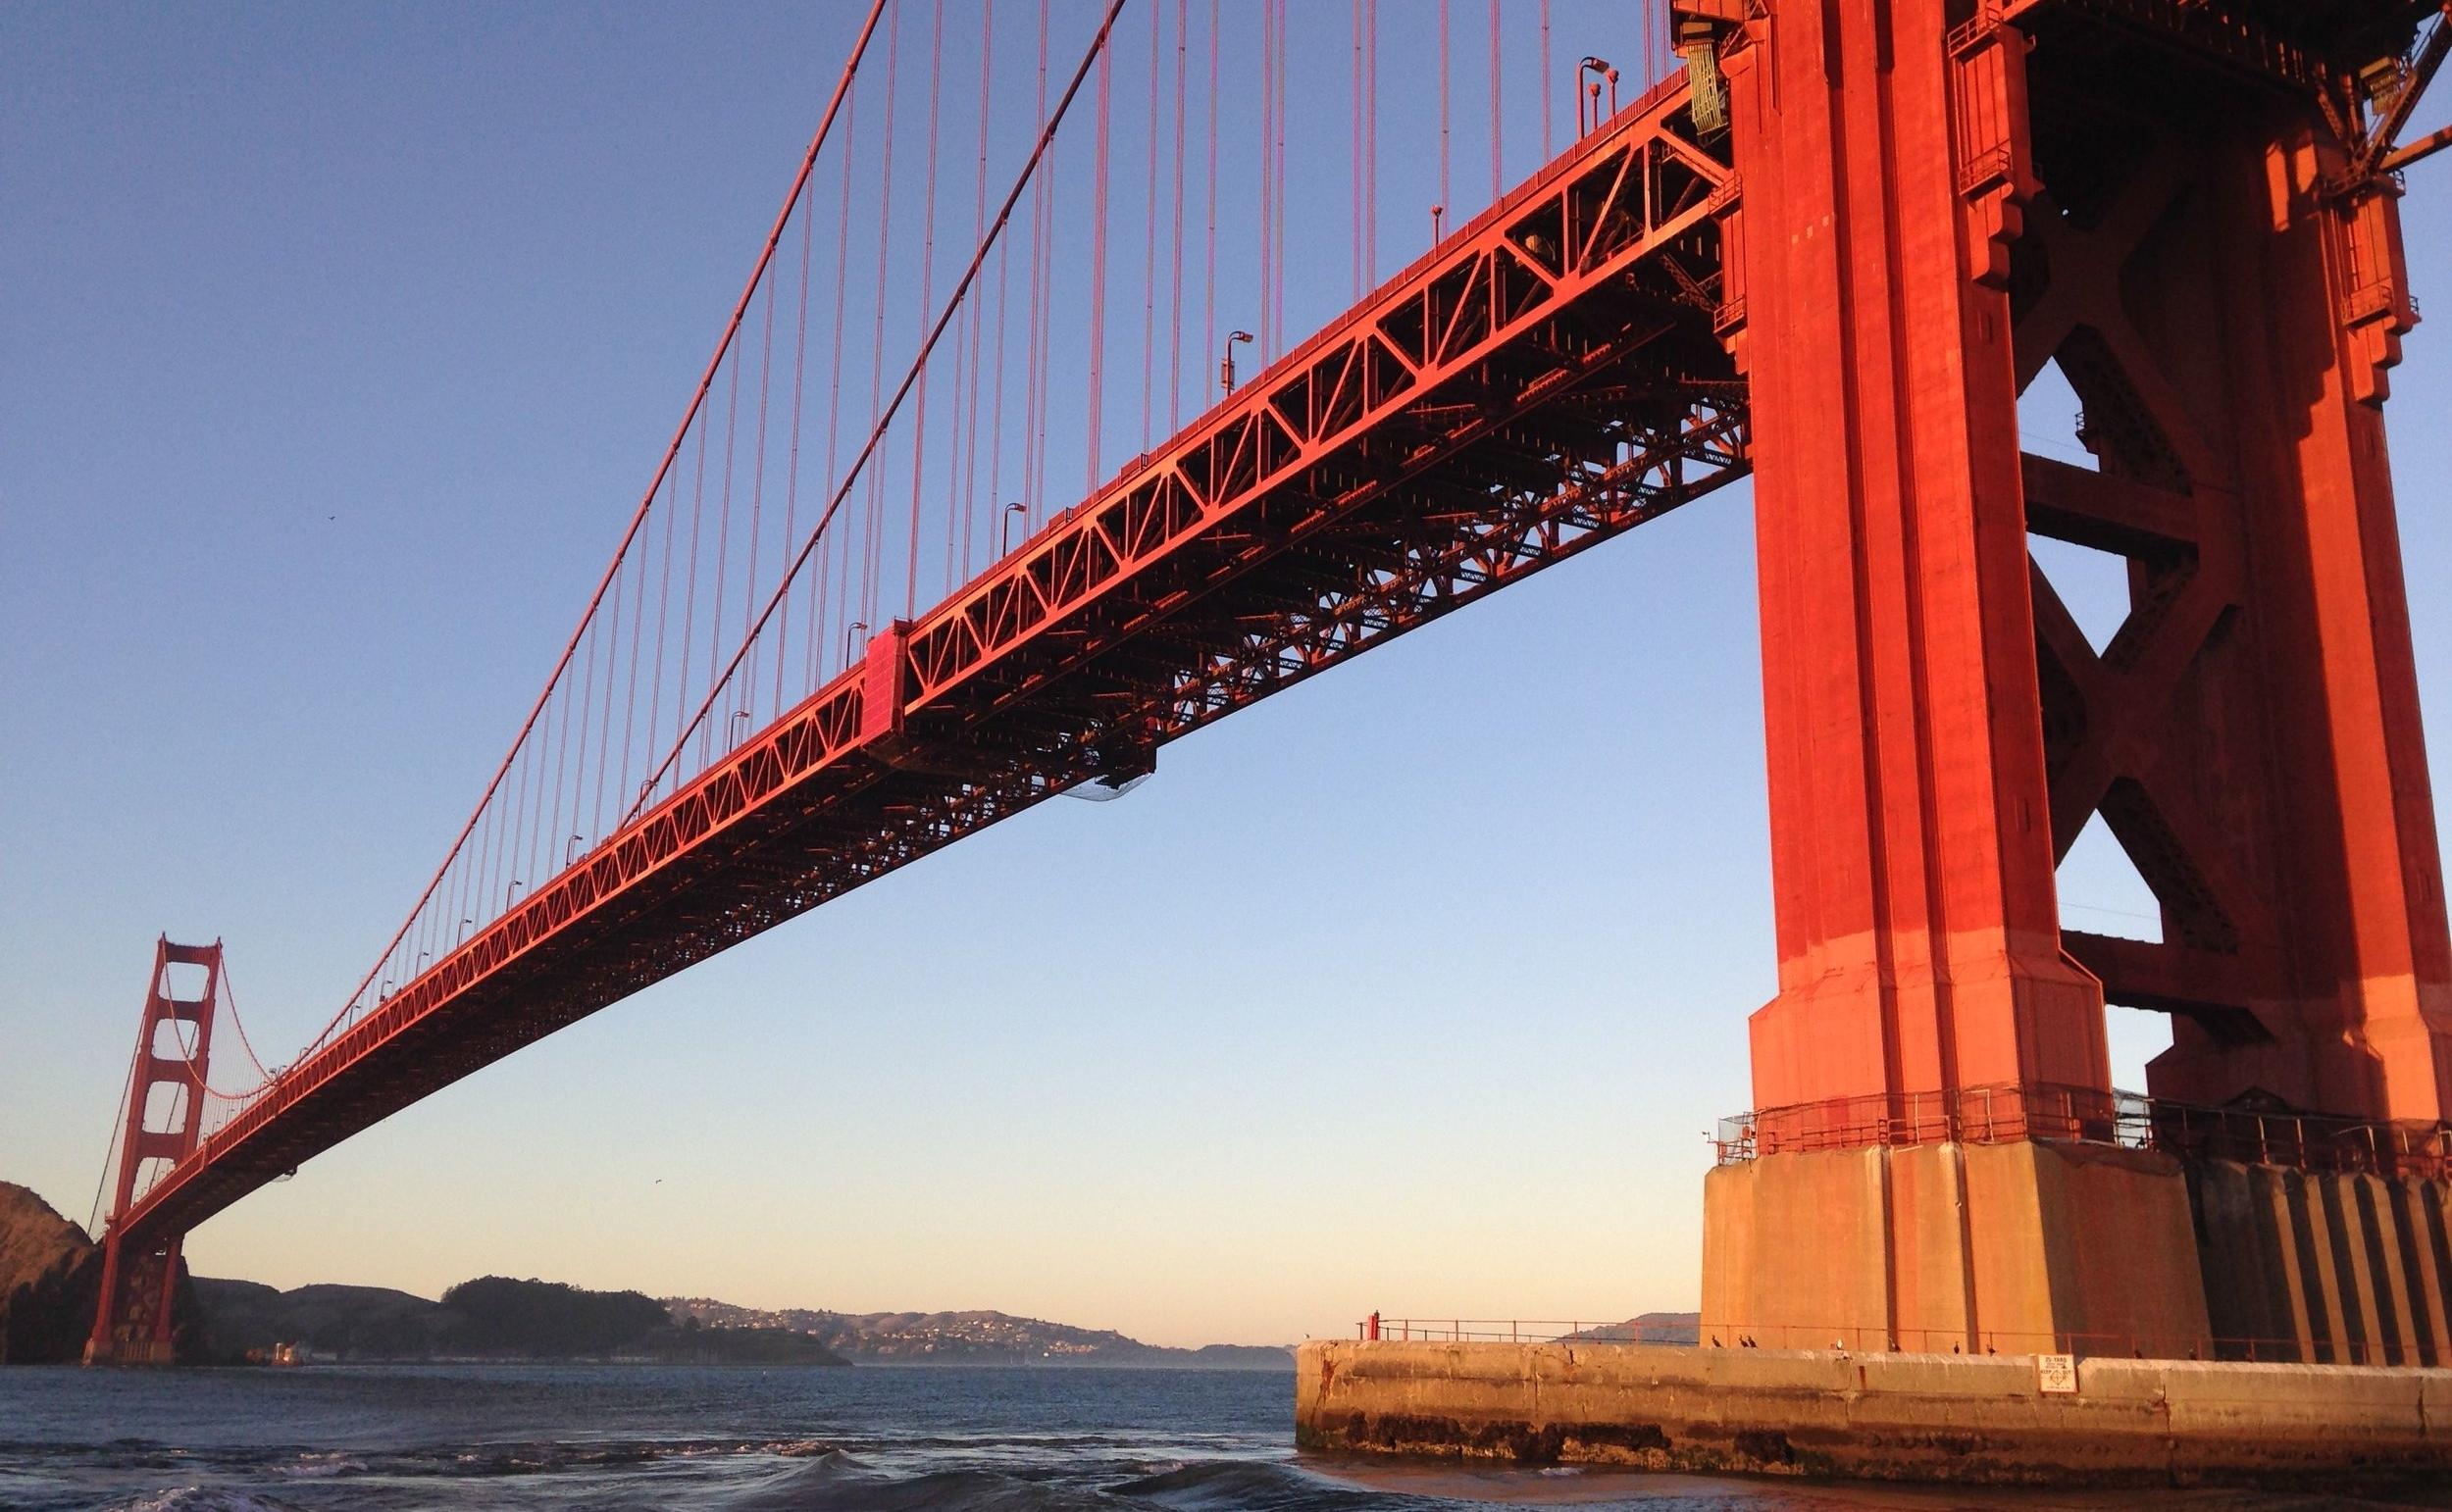 3264px-Below_Golden_Gate_Bridge.jpeg